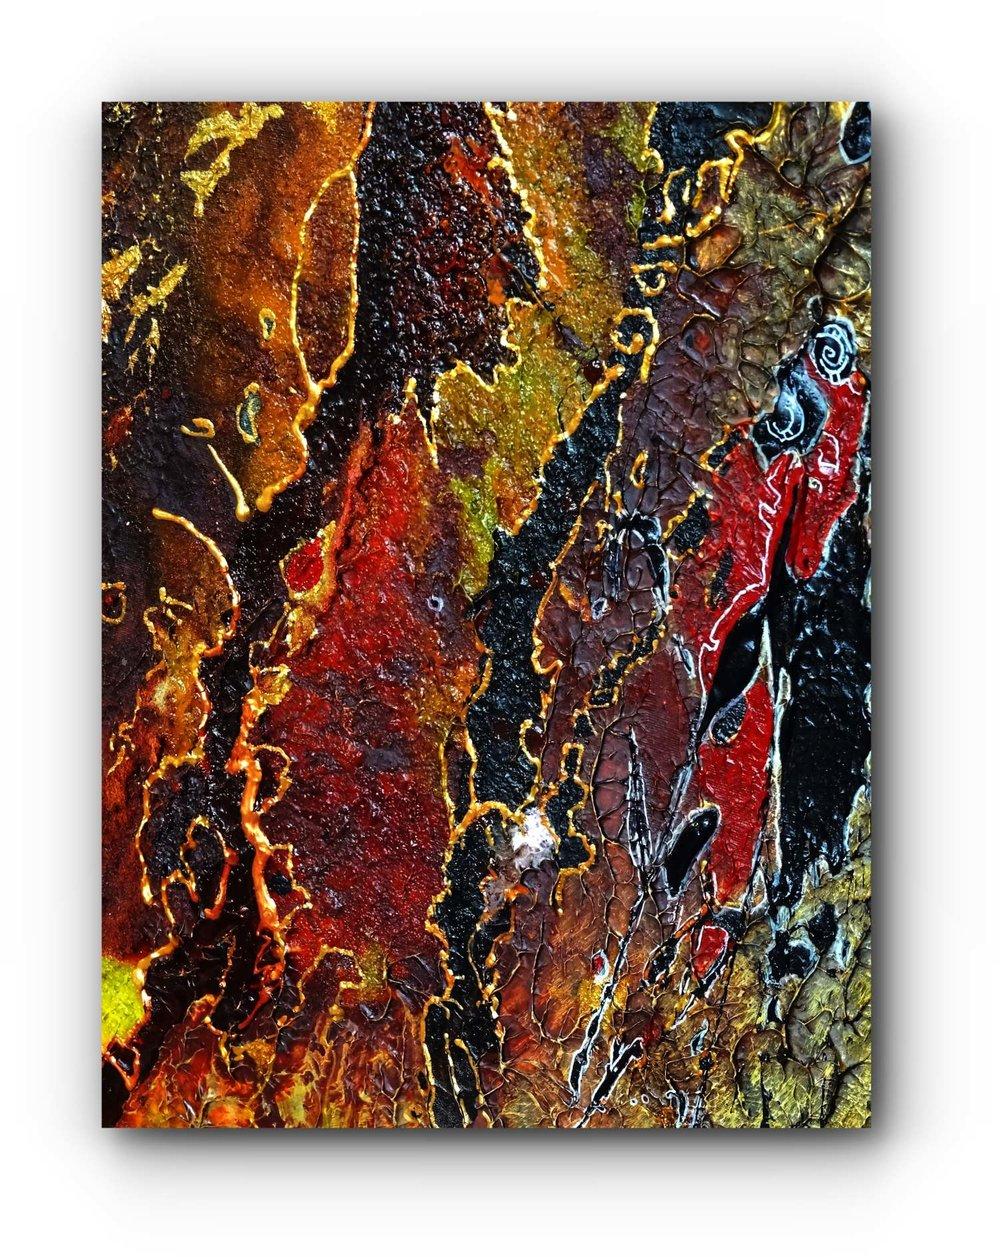 painting-detail-7-golden-sanctuary-artists-ingress-vortices.jpg